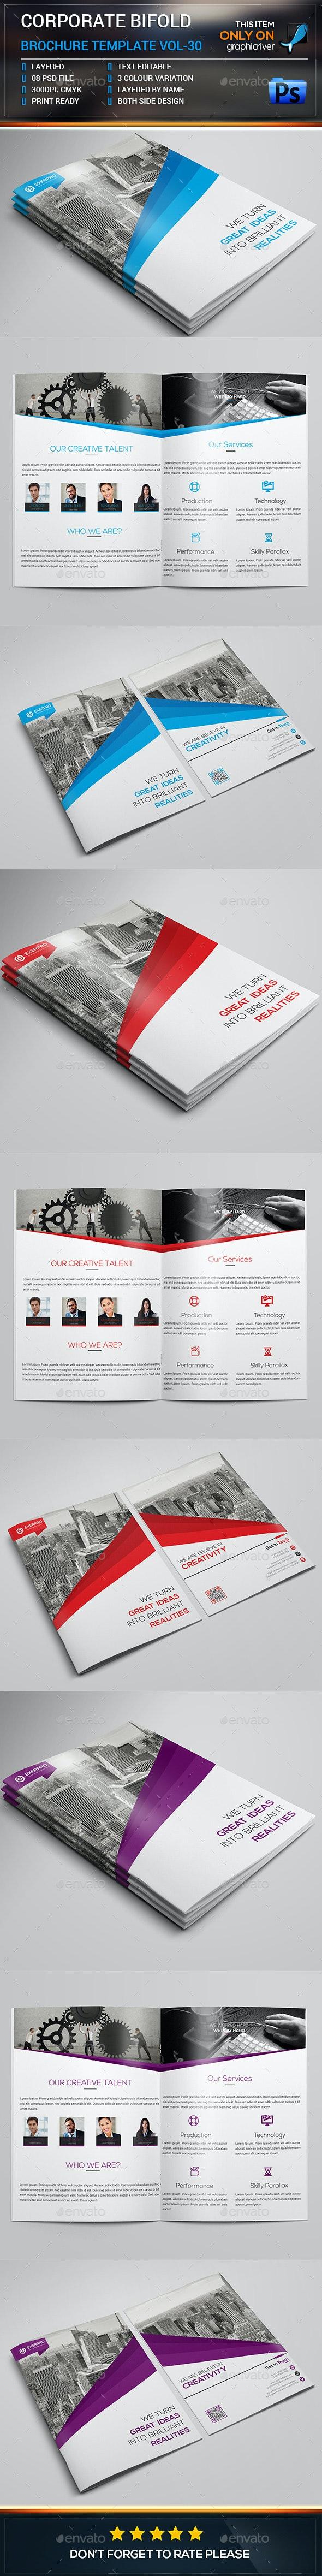 Corporate Bifold Brochure Template  - Brochures Print Templates